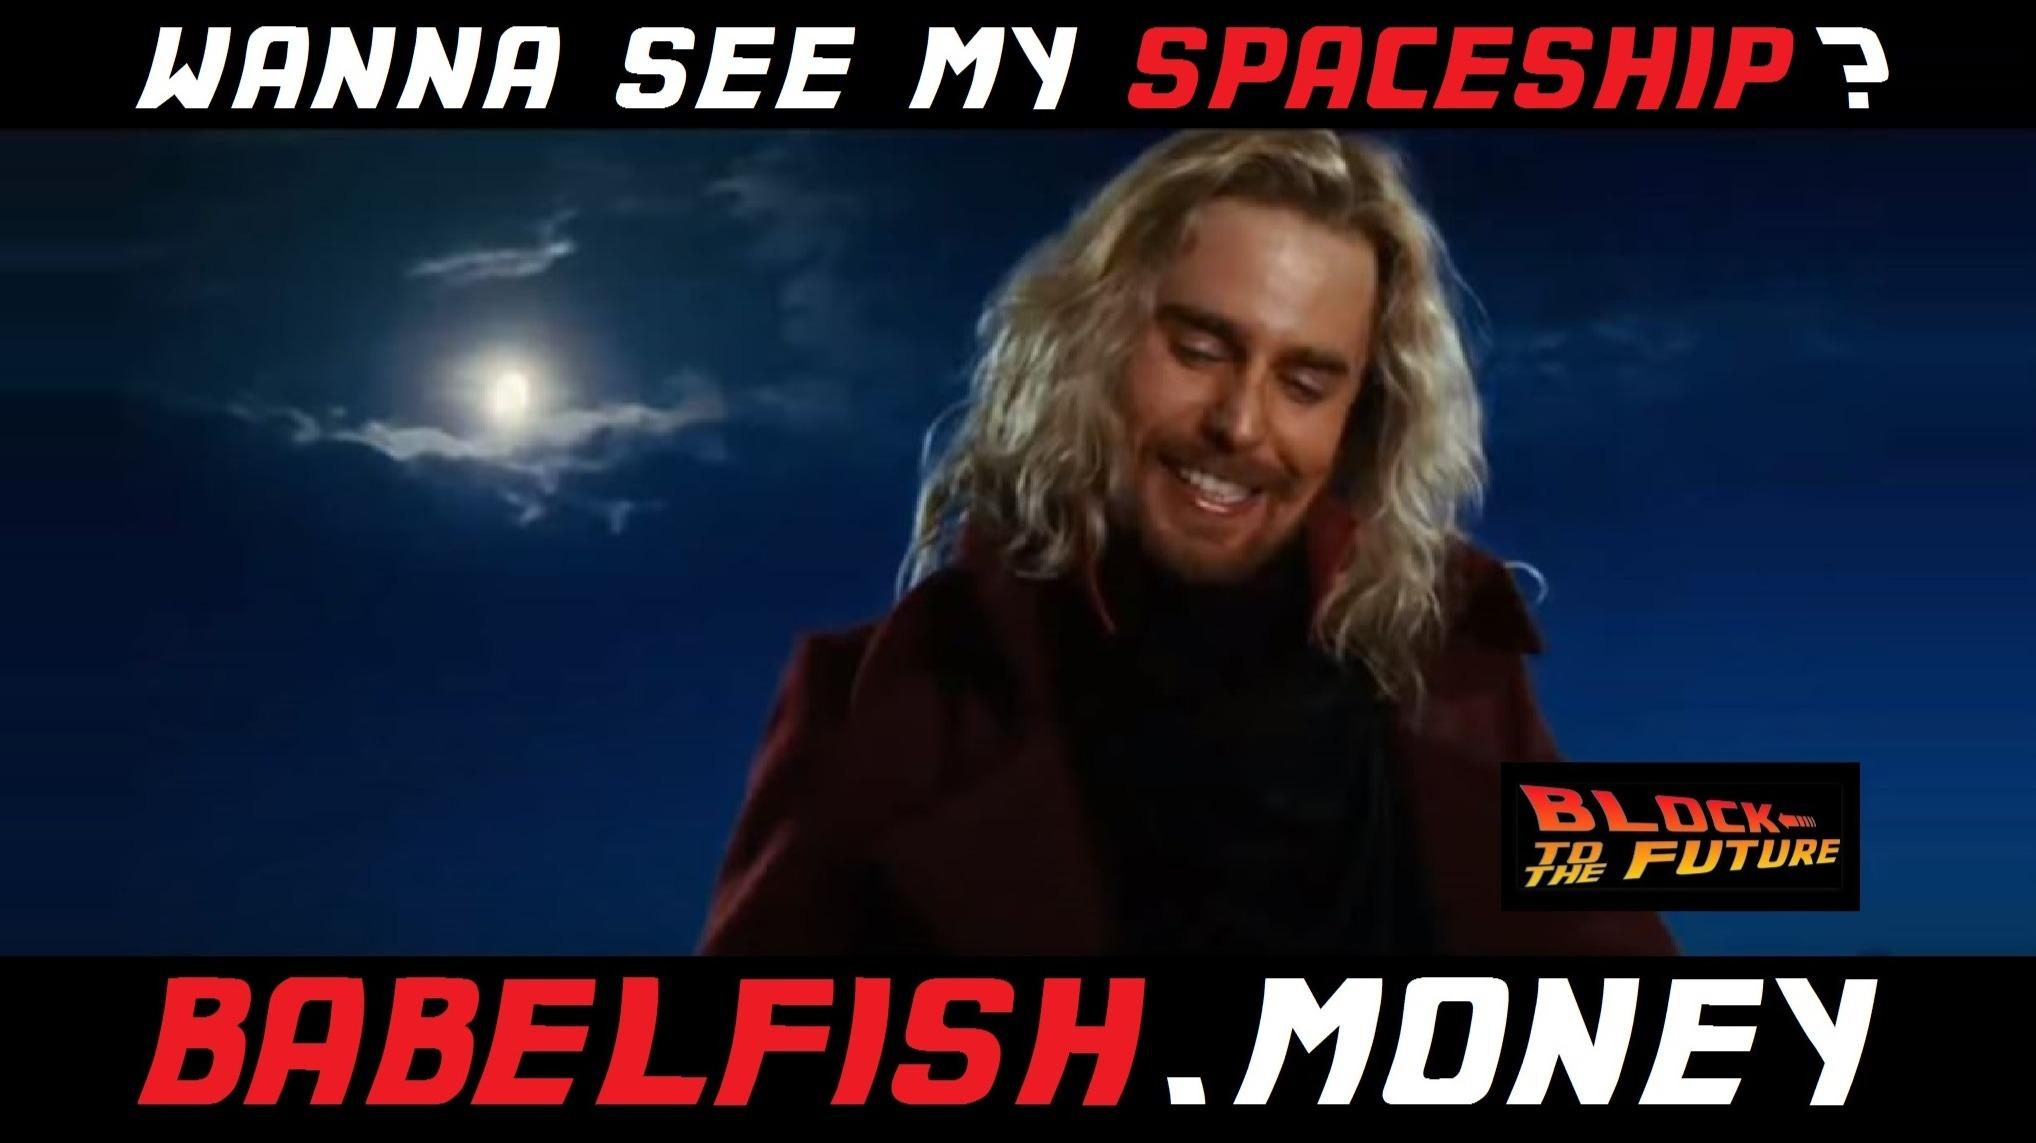 wanna see my spaceship